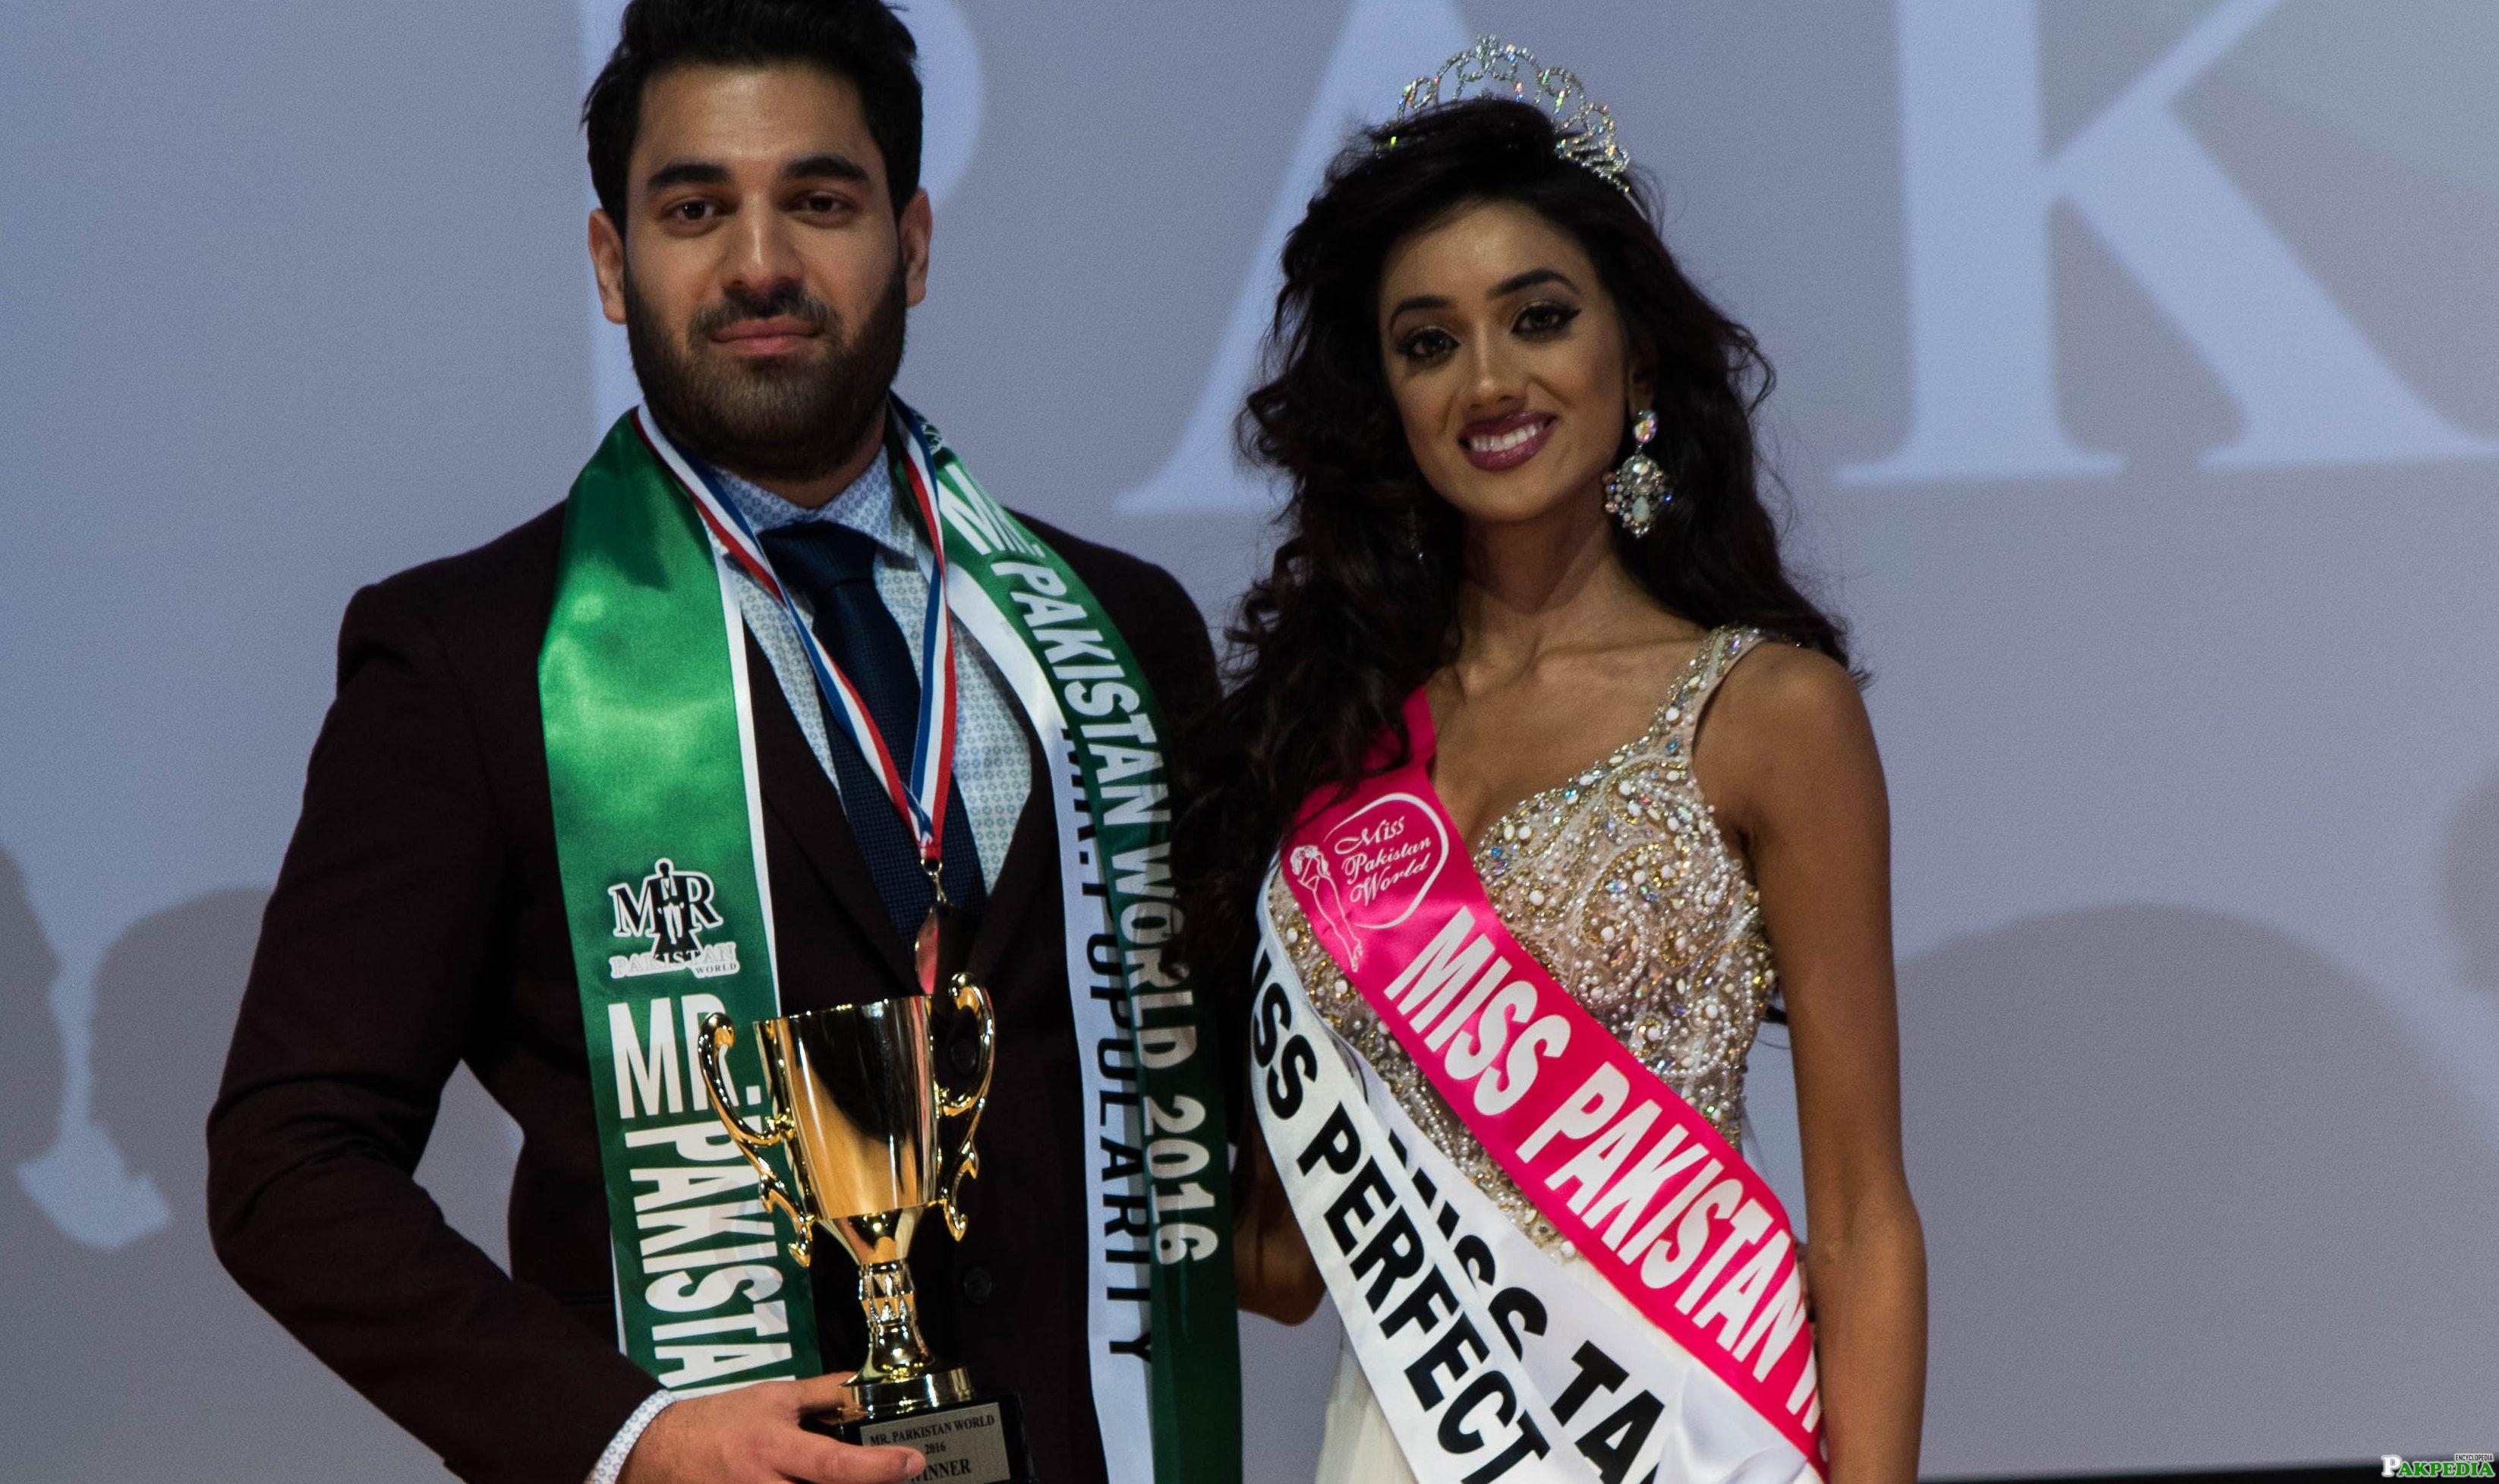 Miss pak and Mr Pakistan